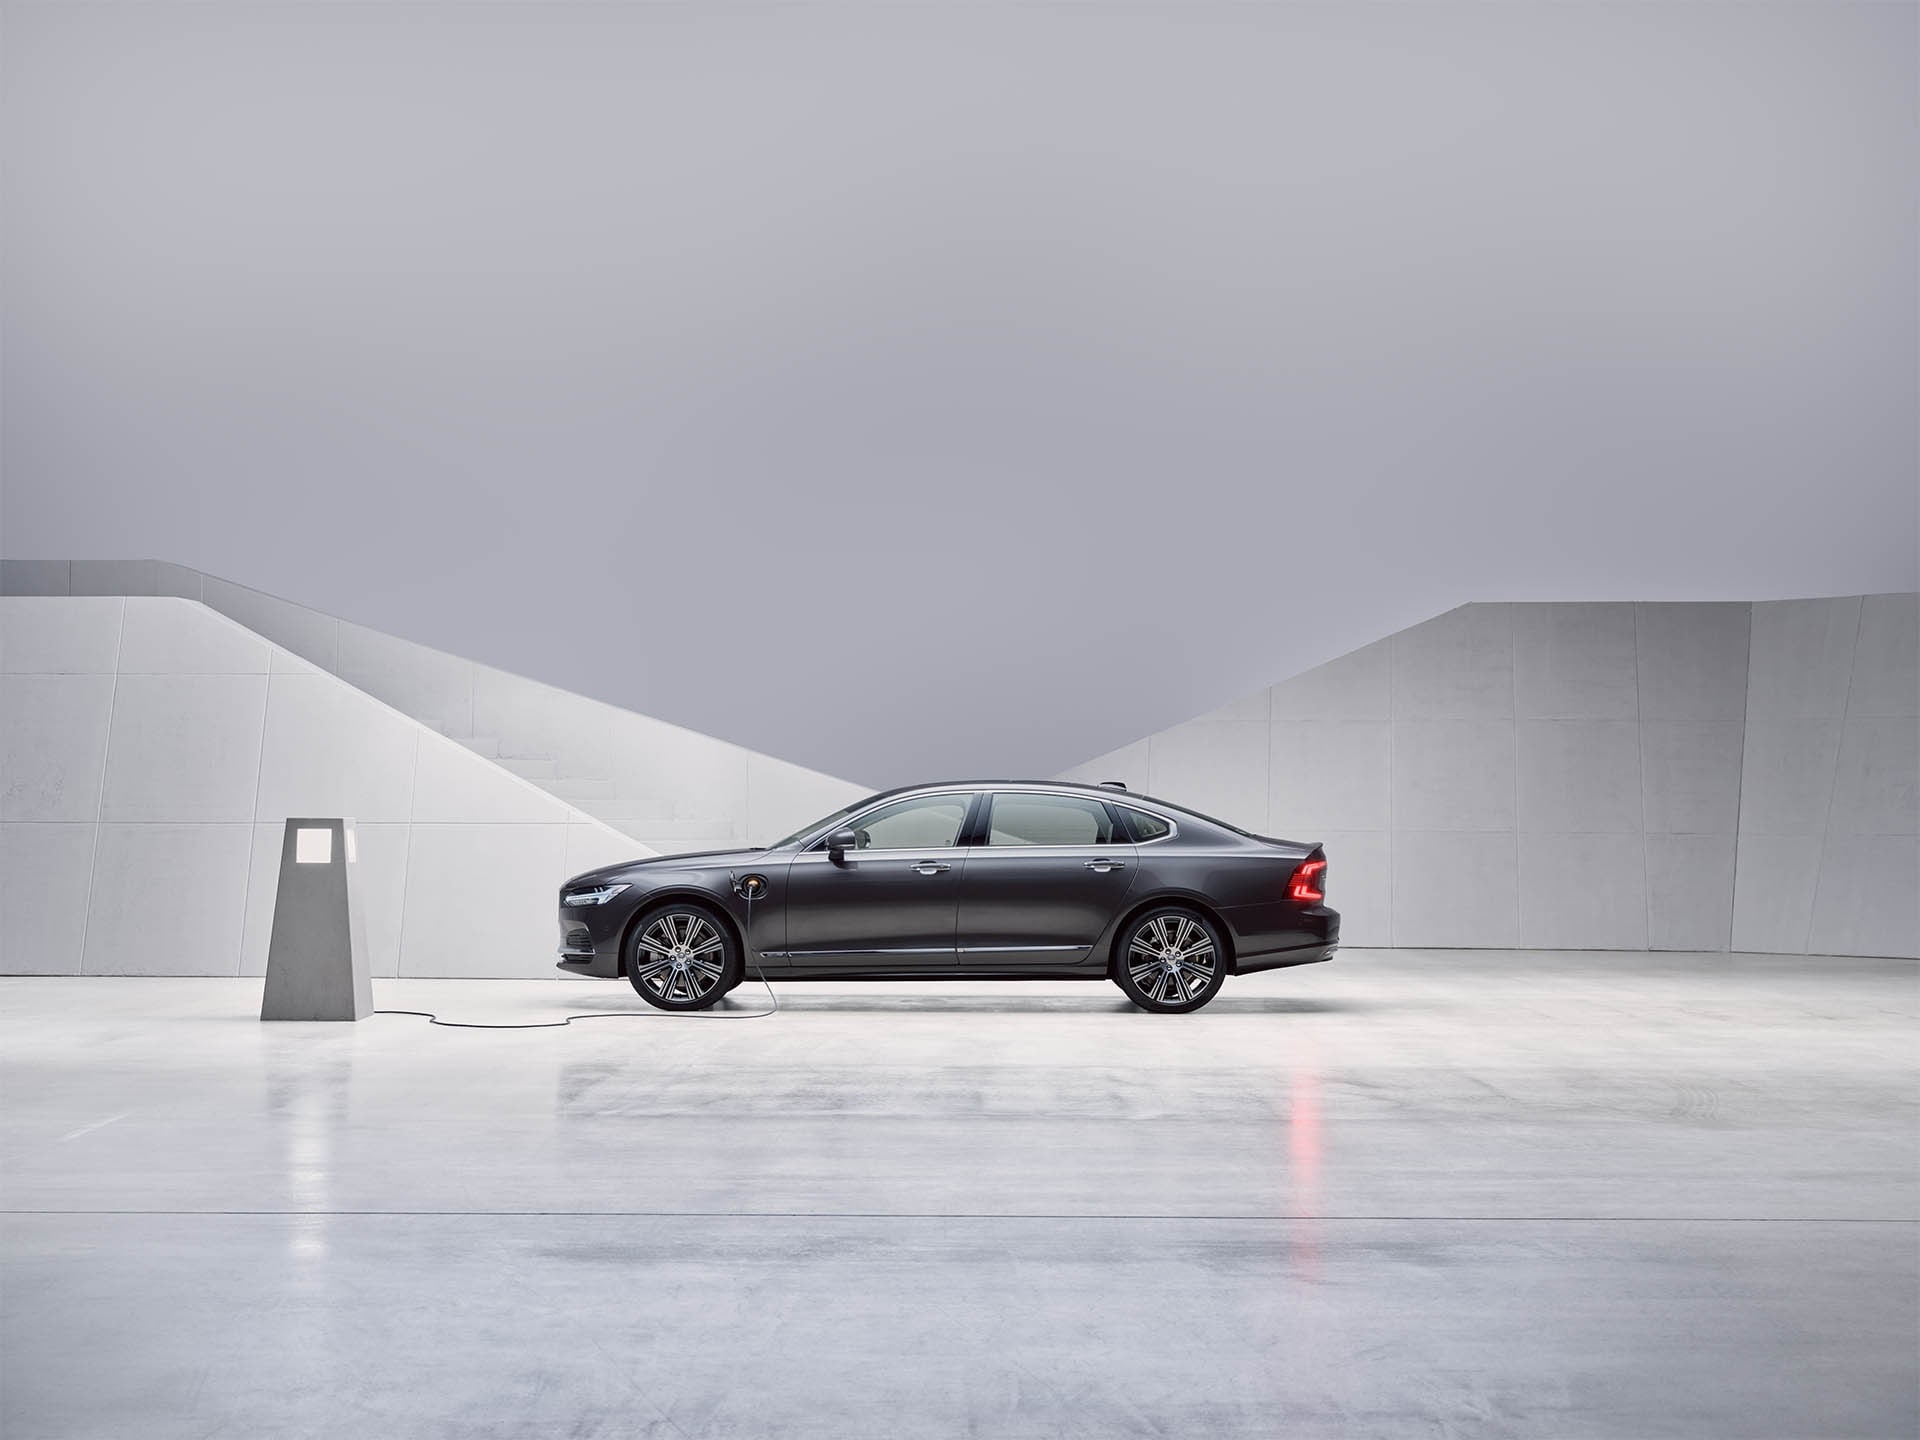 Um sedan Volvo S90 híbrido plug-in Pebble Grey parado e a carregar